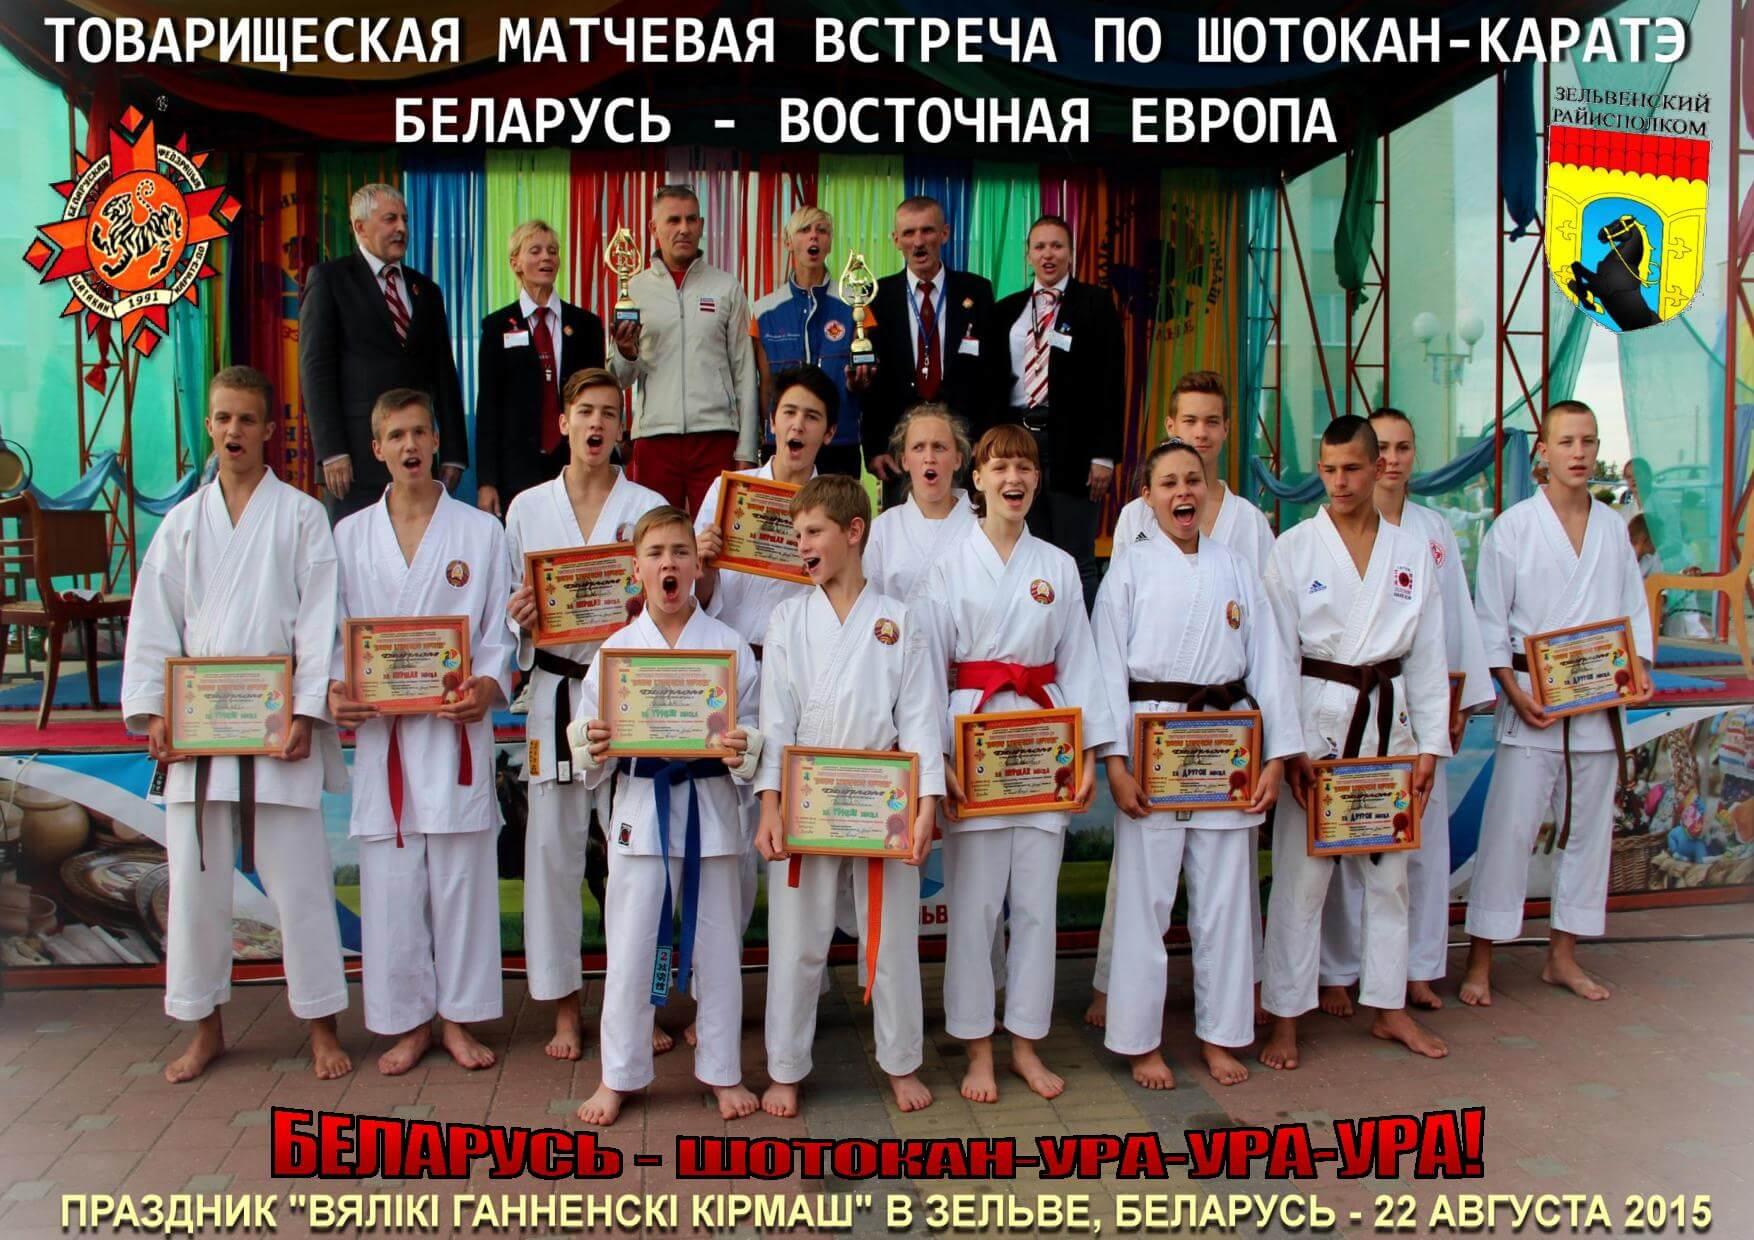 Зельва Кирмаш-2015 Беларусь-шотокан-ура!